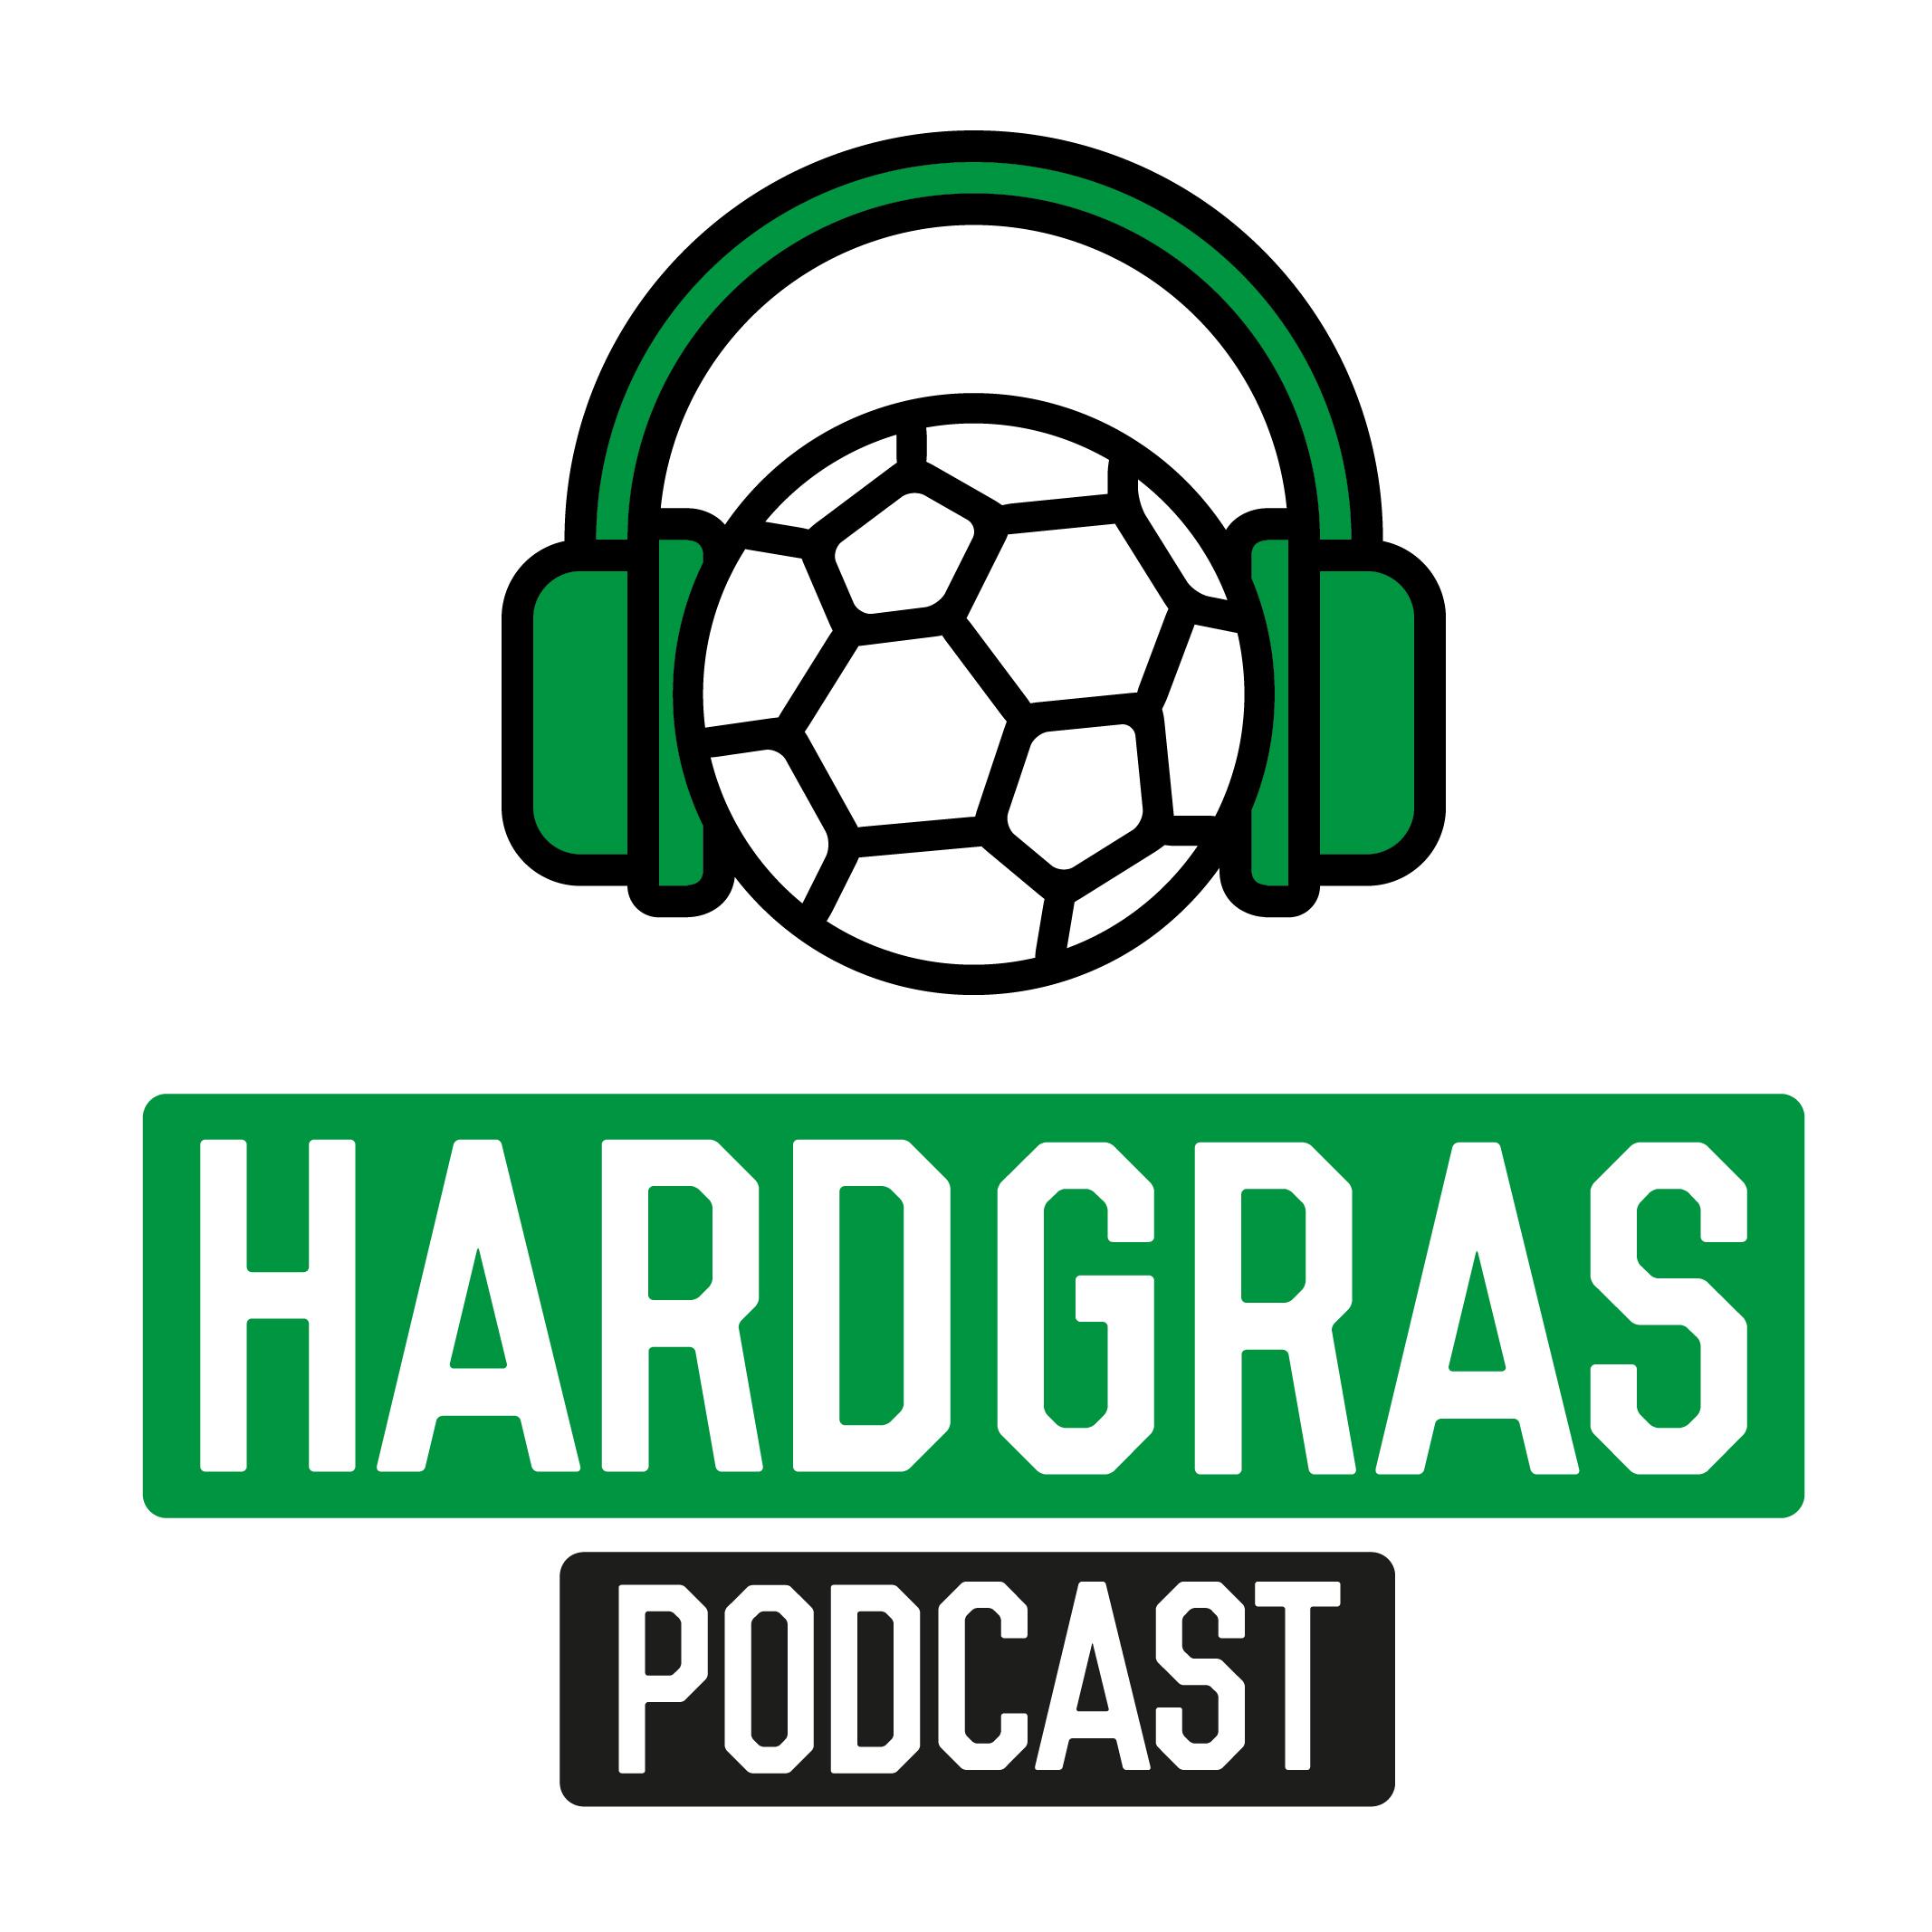 HARDGRAS_podcast_HARDGRAS_podcast_logovolledig.jpg